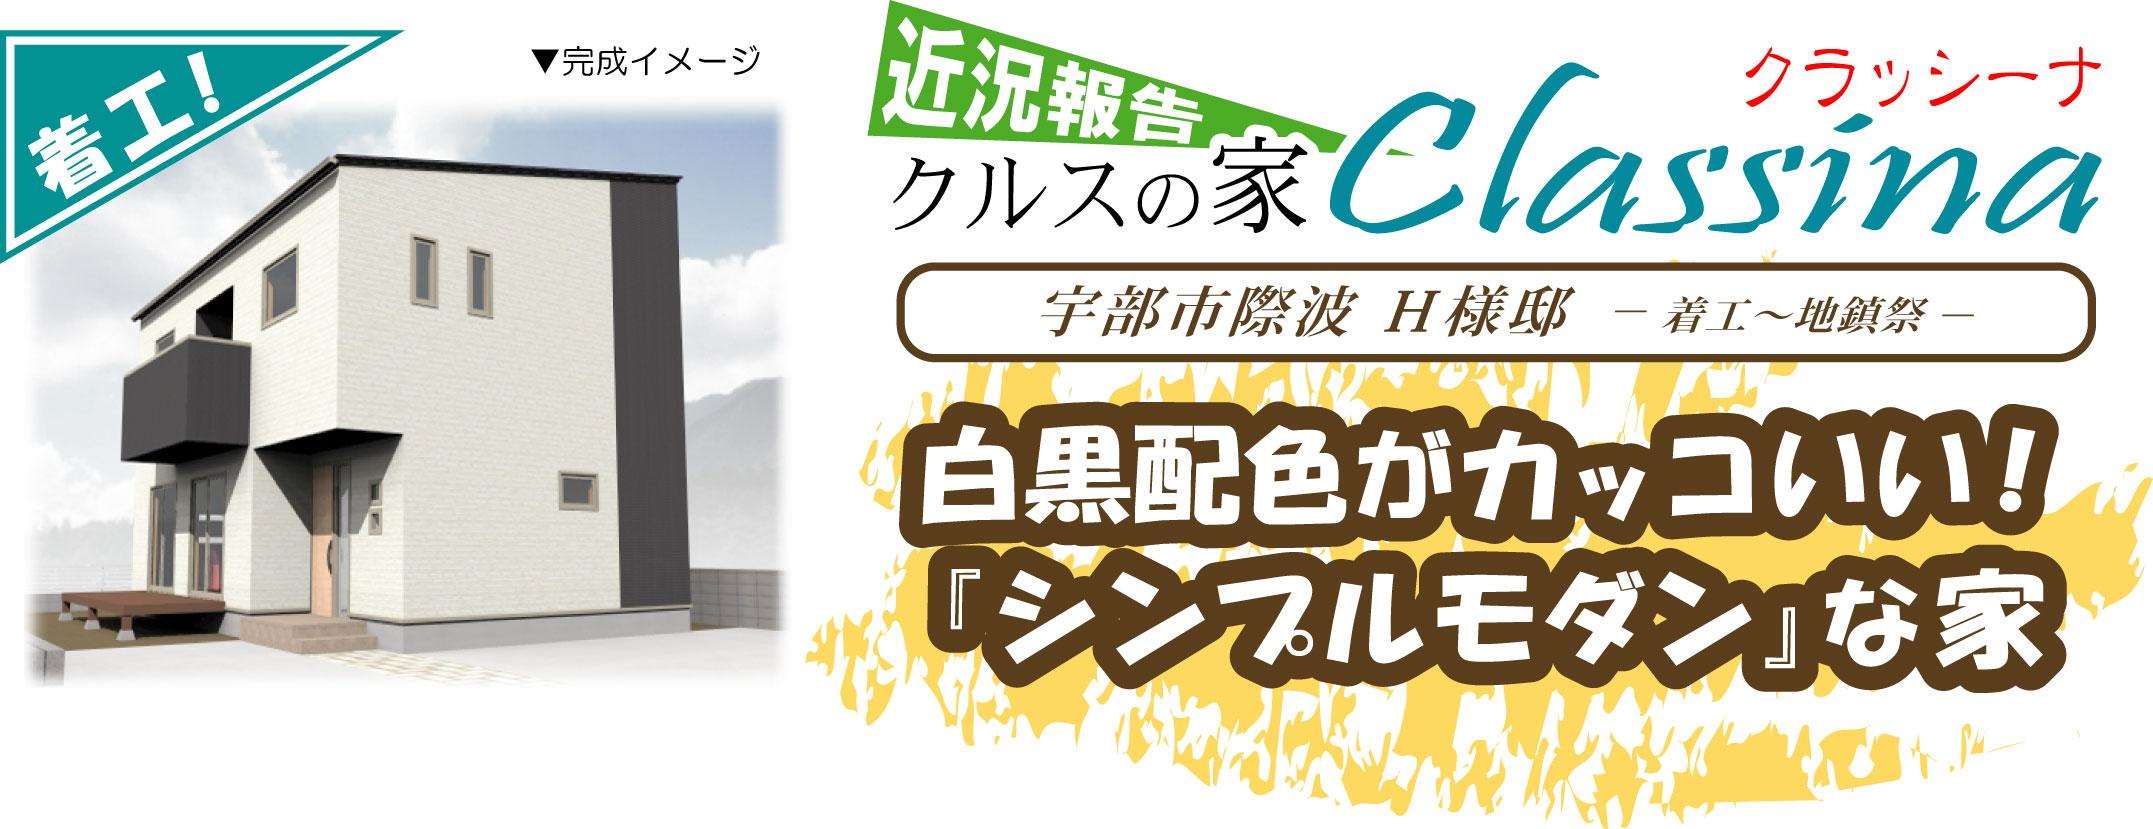 KuraSi-natu-sin61-05.jpg